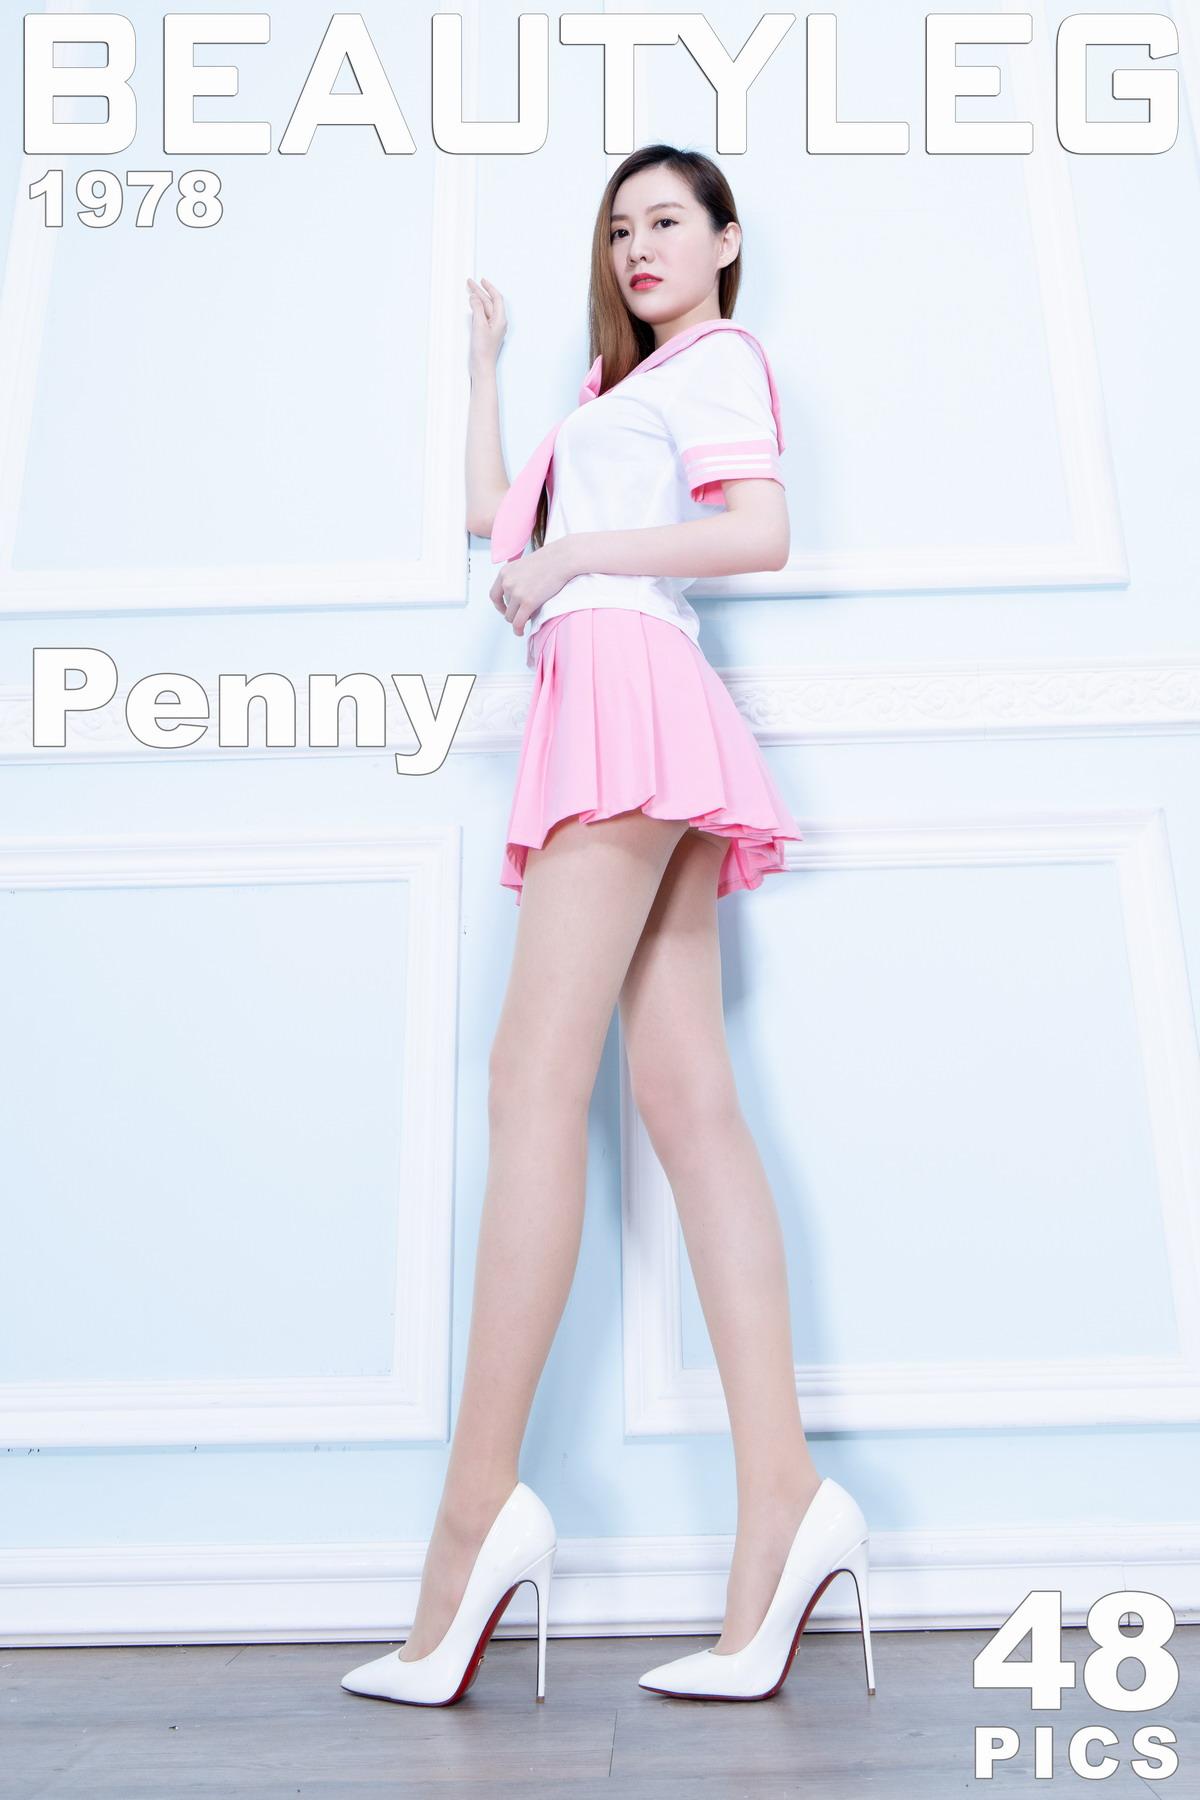 [Beautyleg]美腿写真 2020.09.28 No.1978 Penny[/365M]